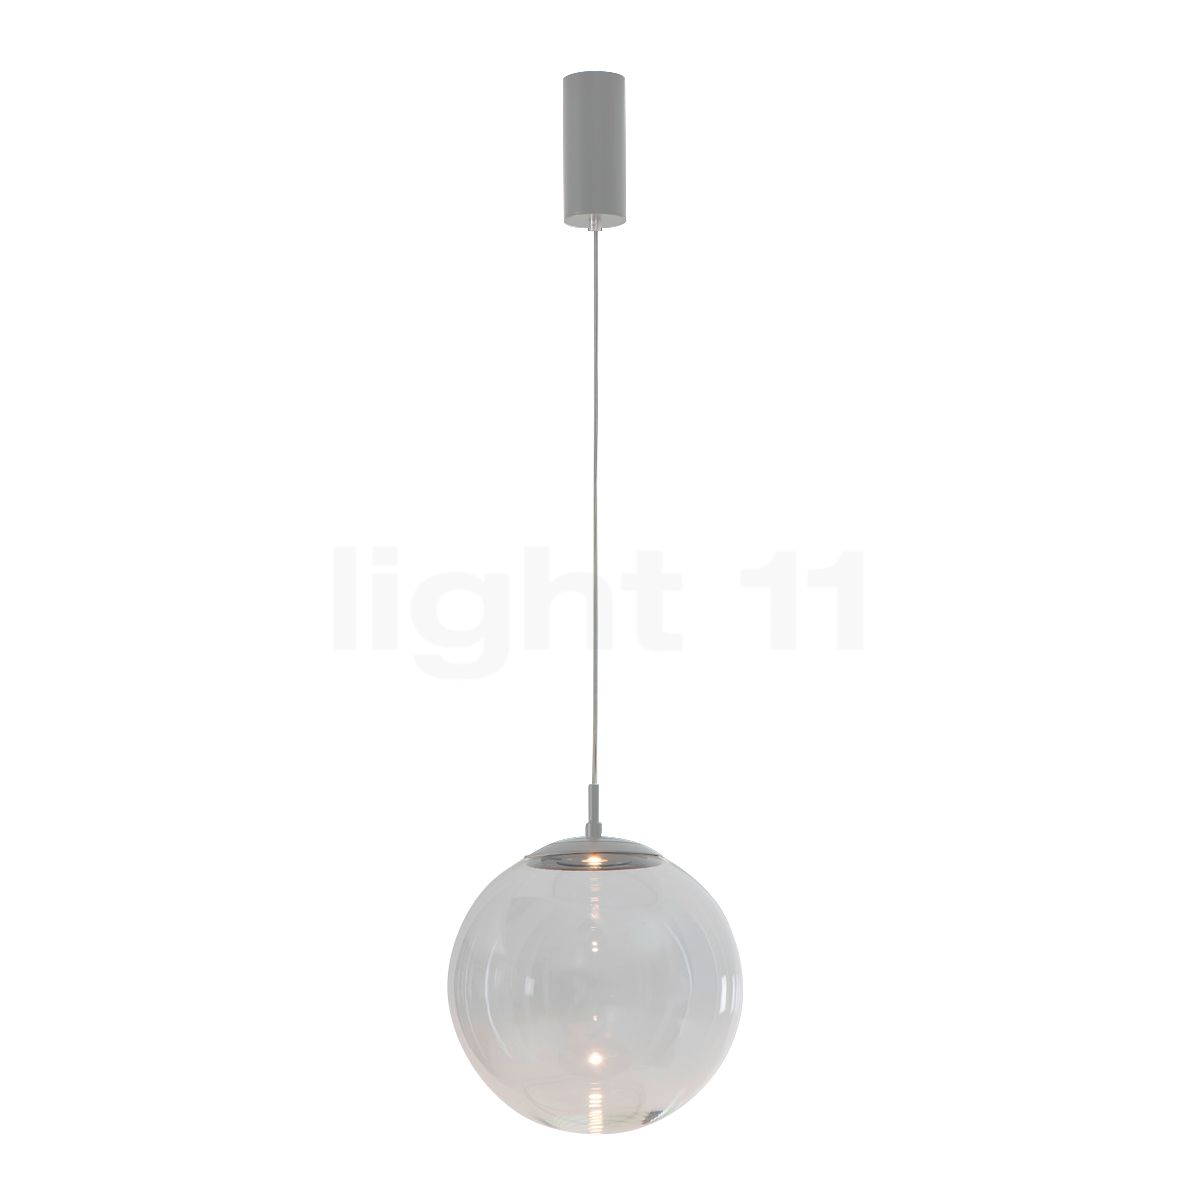 Mawa Glaskugelleuchte LED, Kristallglas/grau metallic ku3-7-3000-gc-DB702